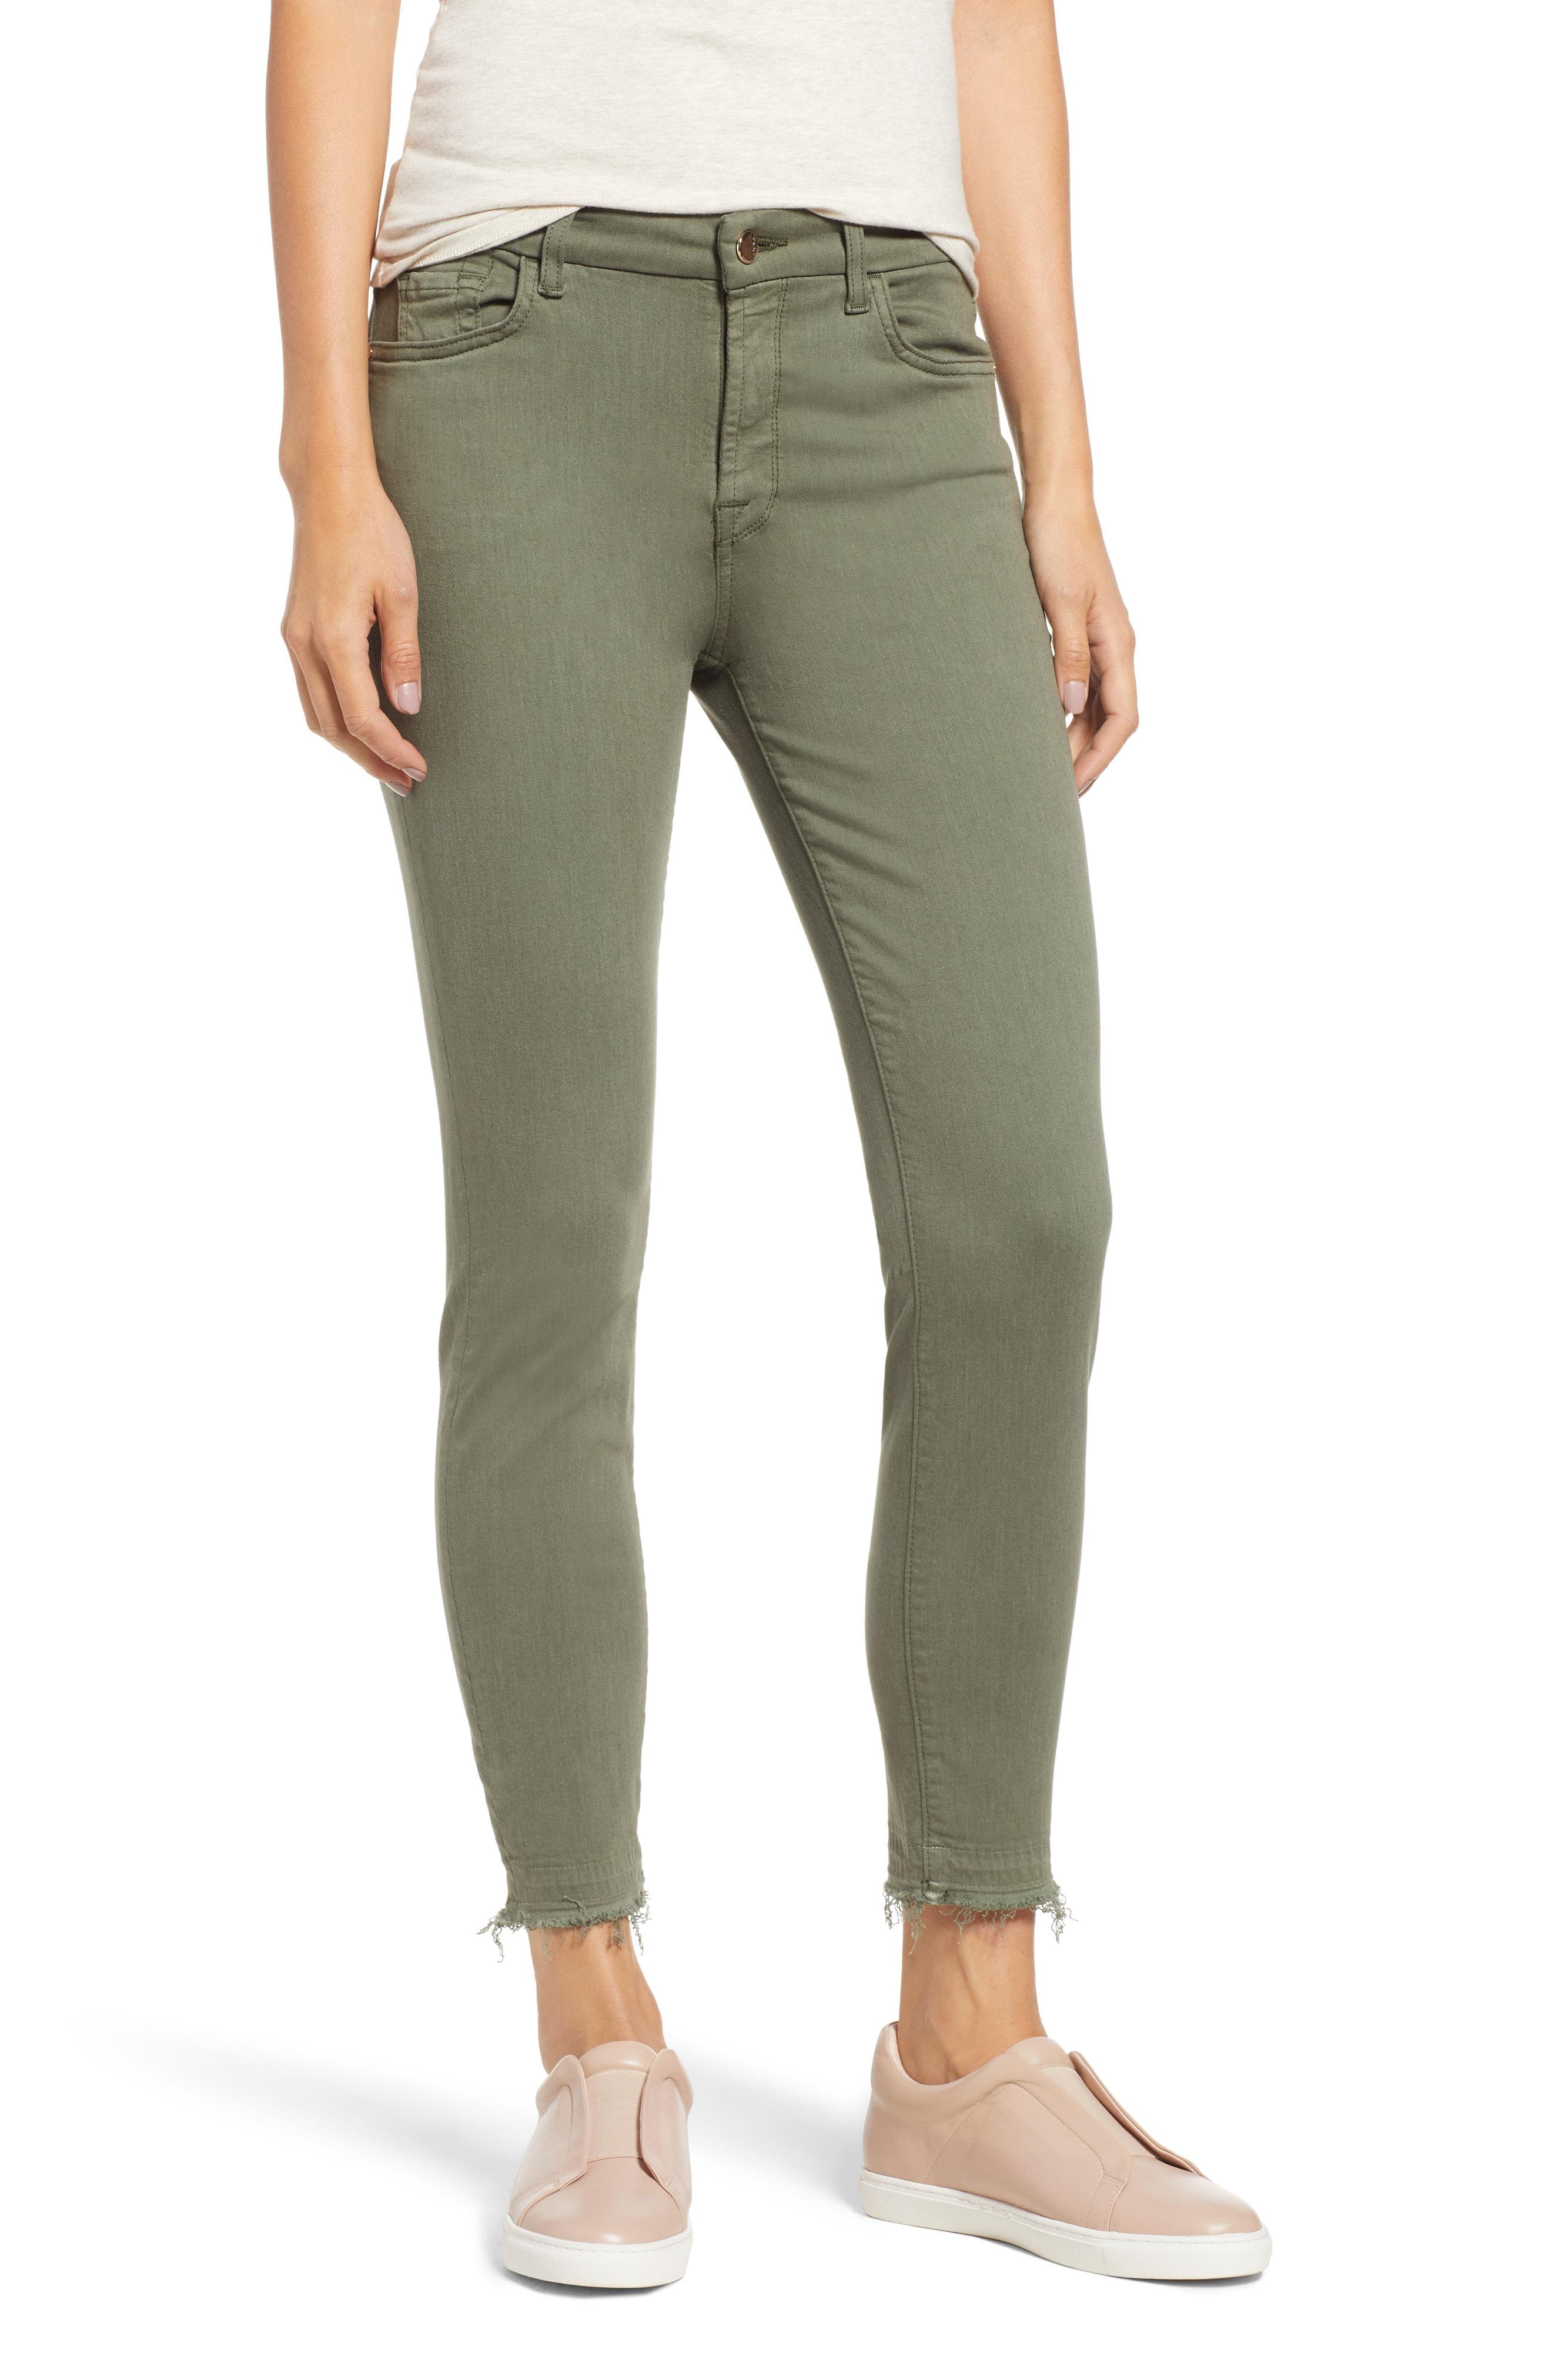 Women's Skinny Jeans   Nordstrom